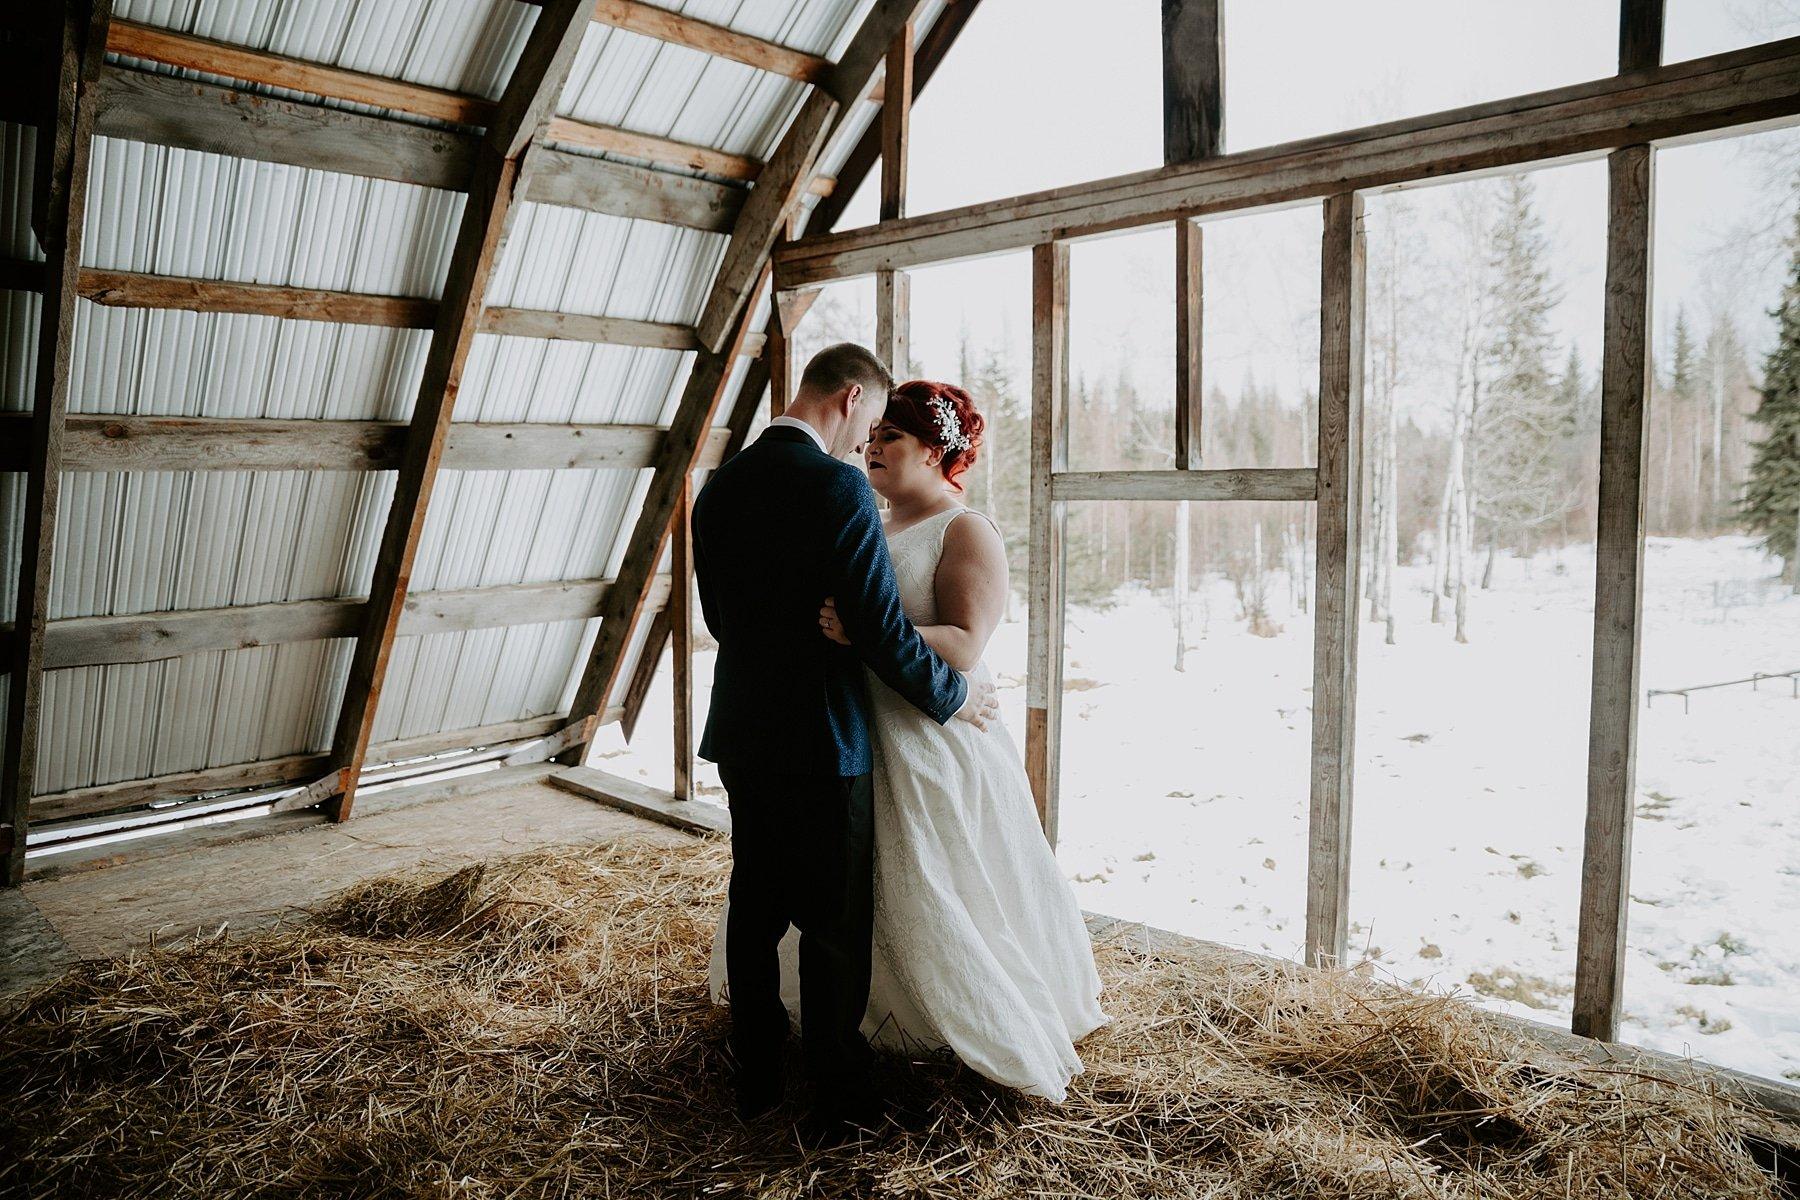 First look wedding in a barn